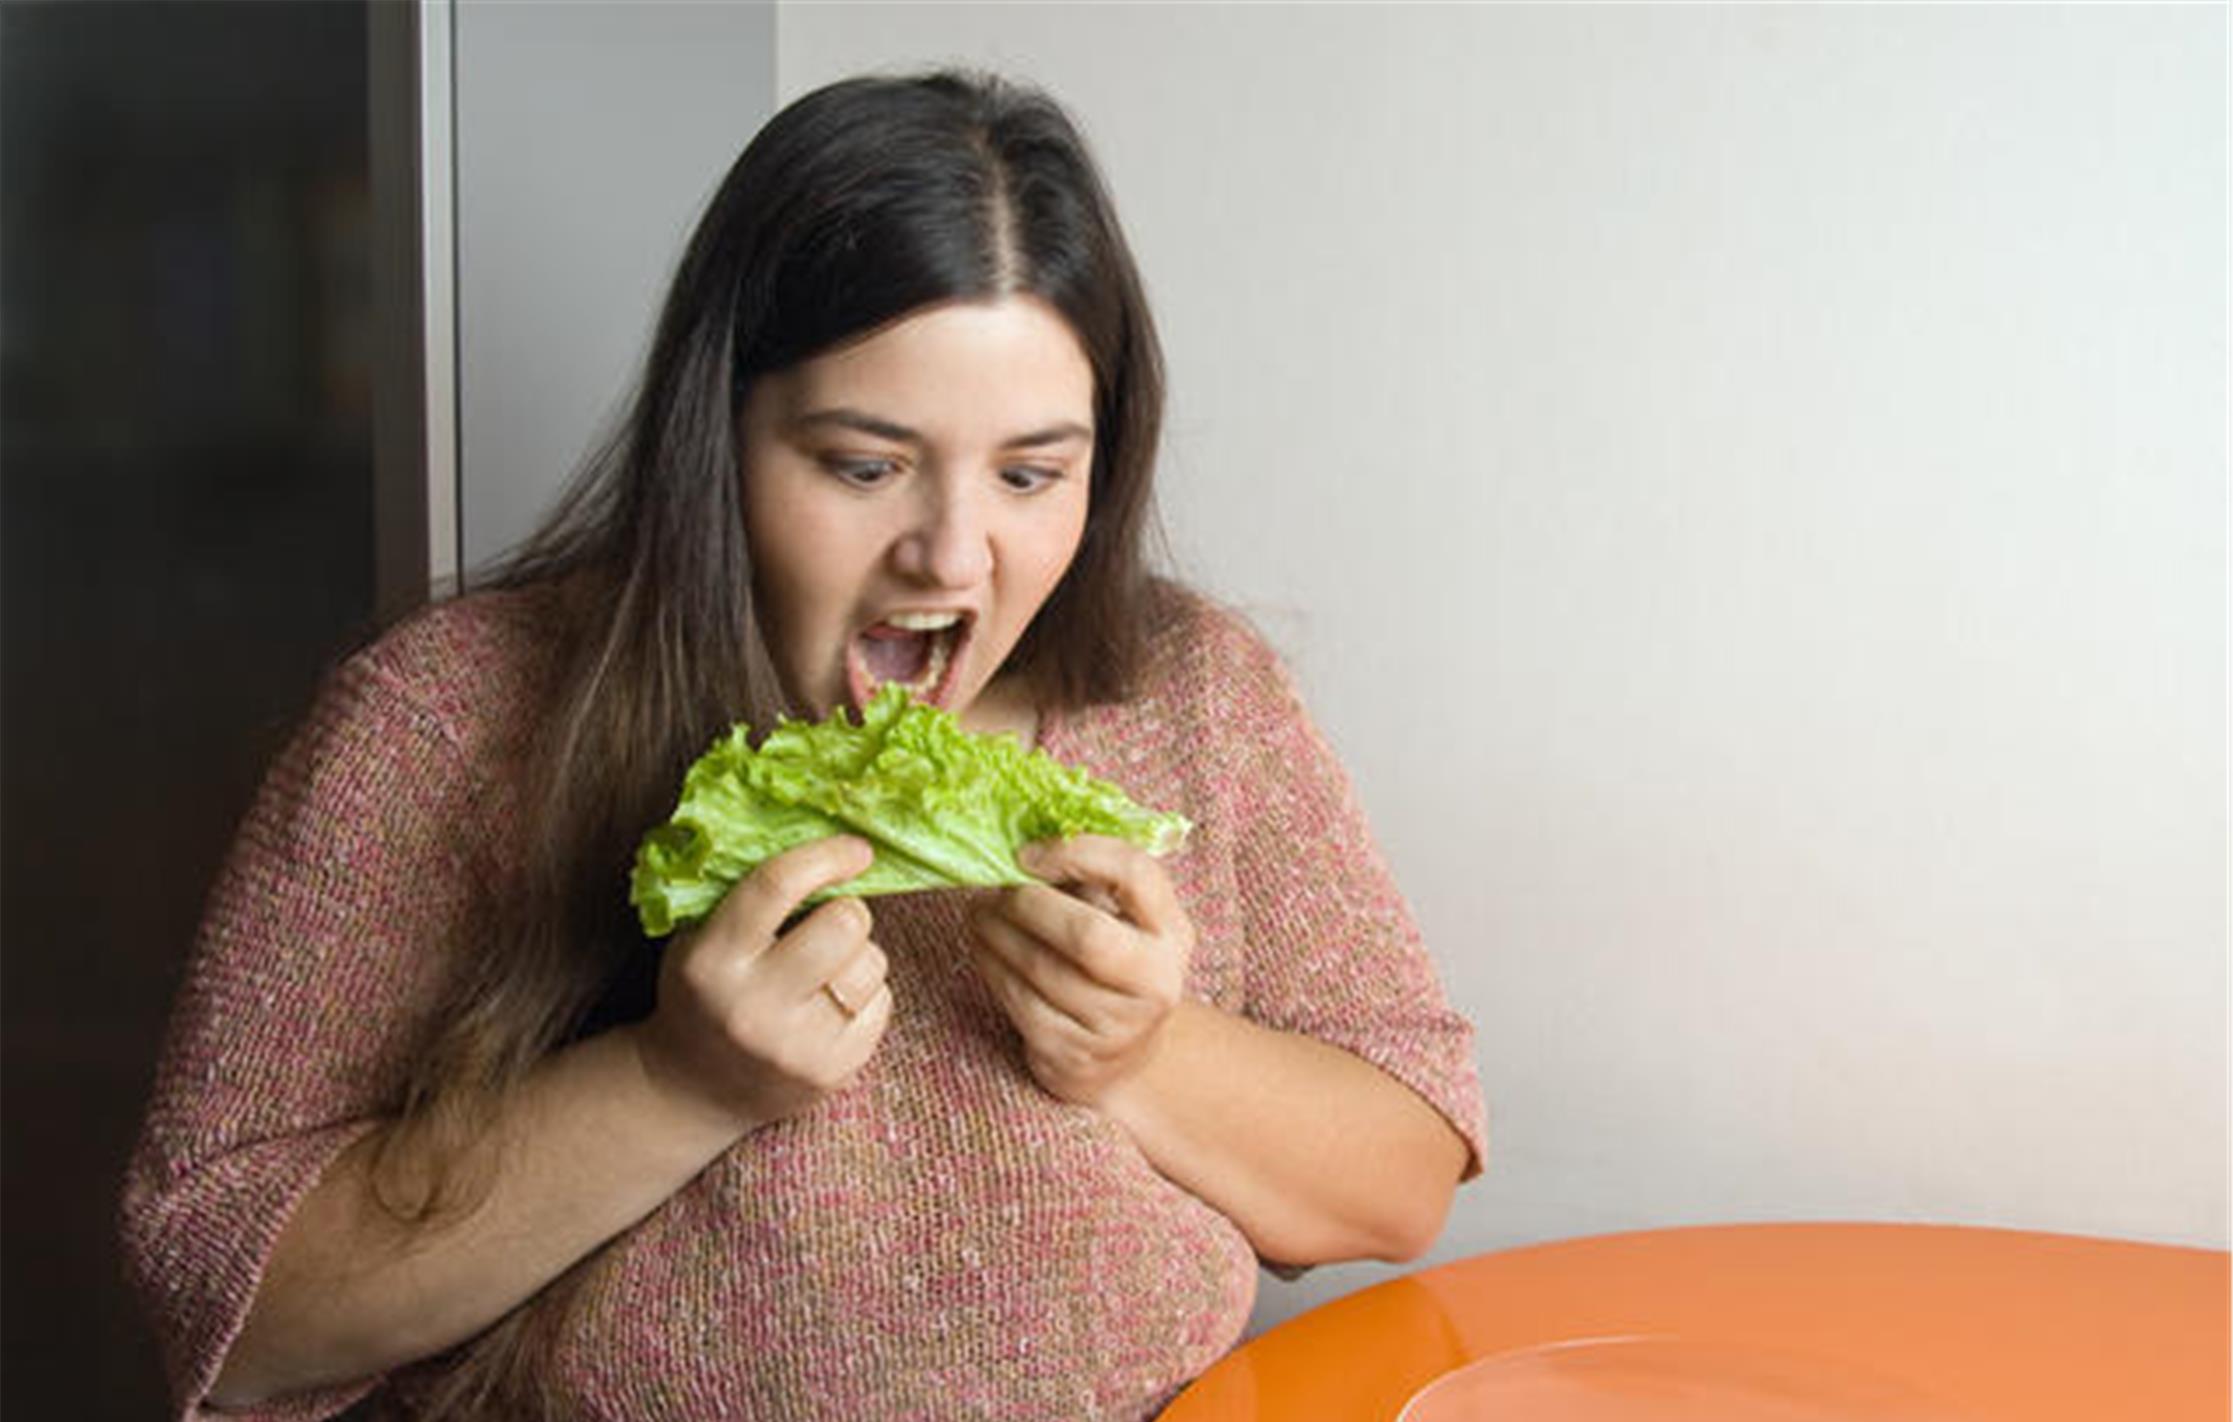 adc是什么意思_晚餐期间,不能忘记减肥,常吃3物,忌口4物,或能帮助刮油燃脂